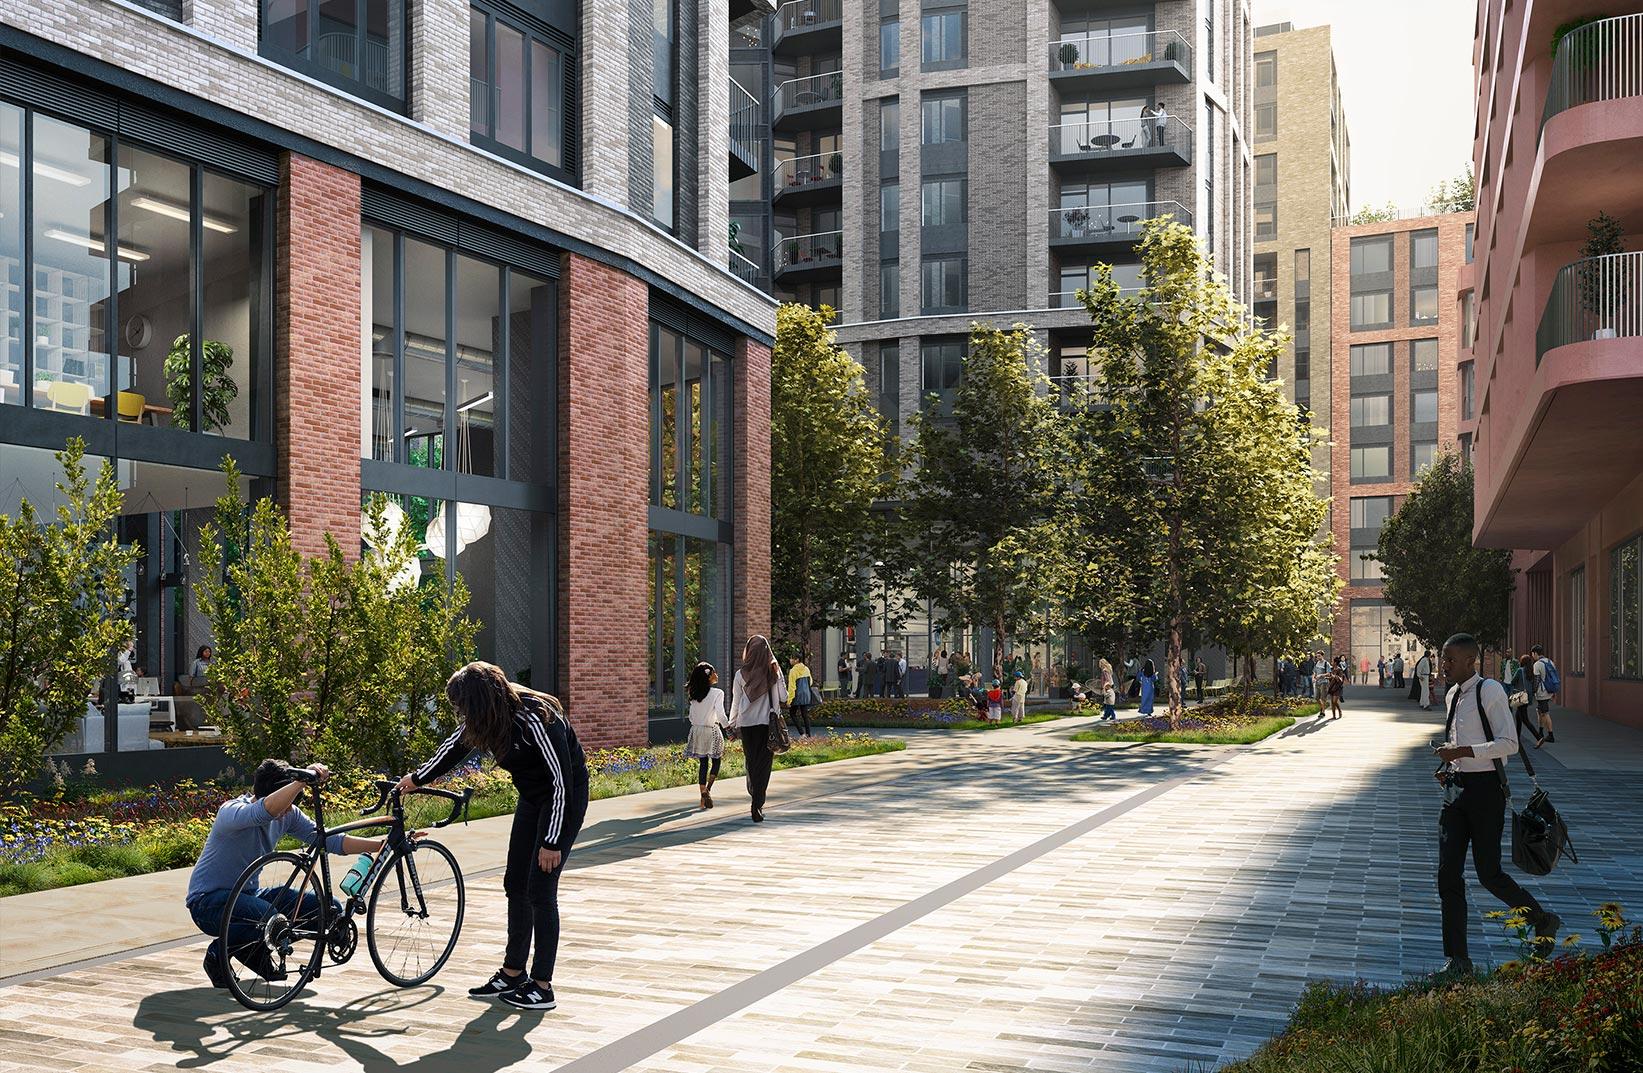 MacBean Street, Woolwich, London : 3D Visual of landscaped walkway